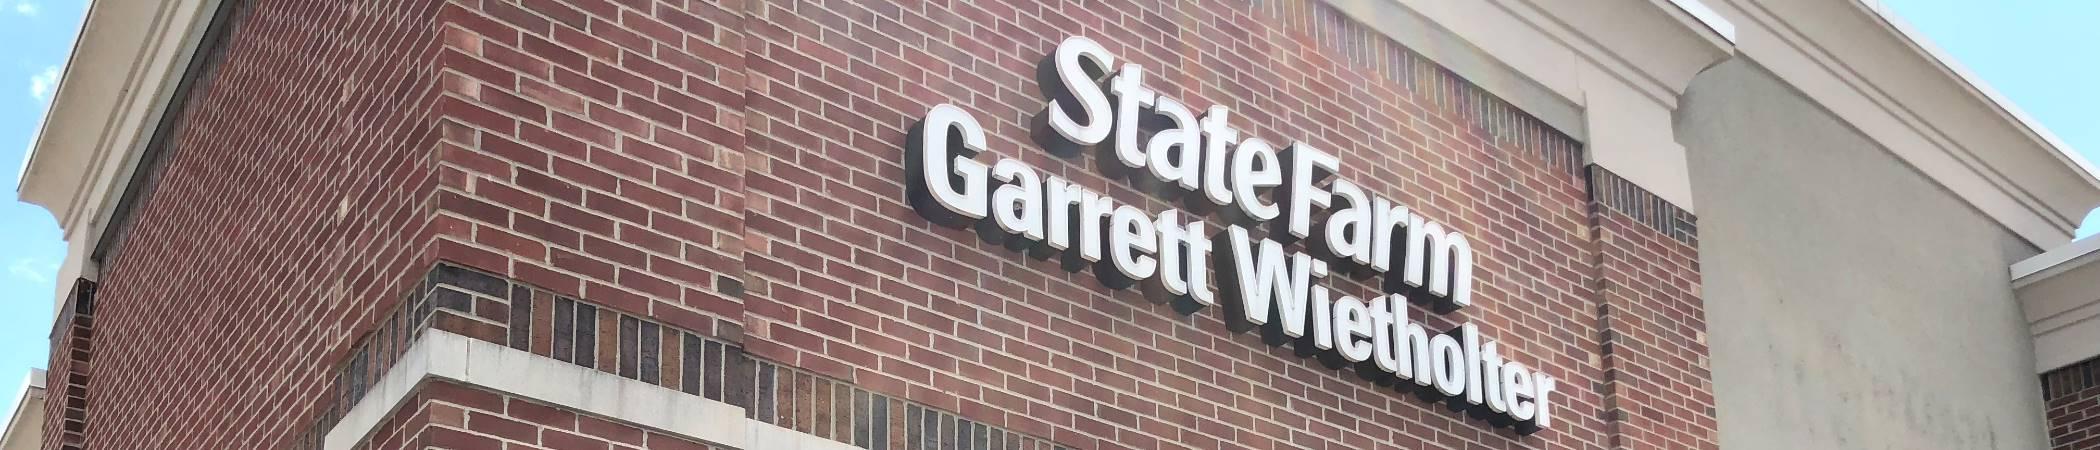 Garrett Wietholter State Farm Insurance in Zionsville, IN | Home, Auto Insurance & more